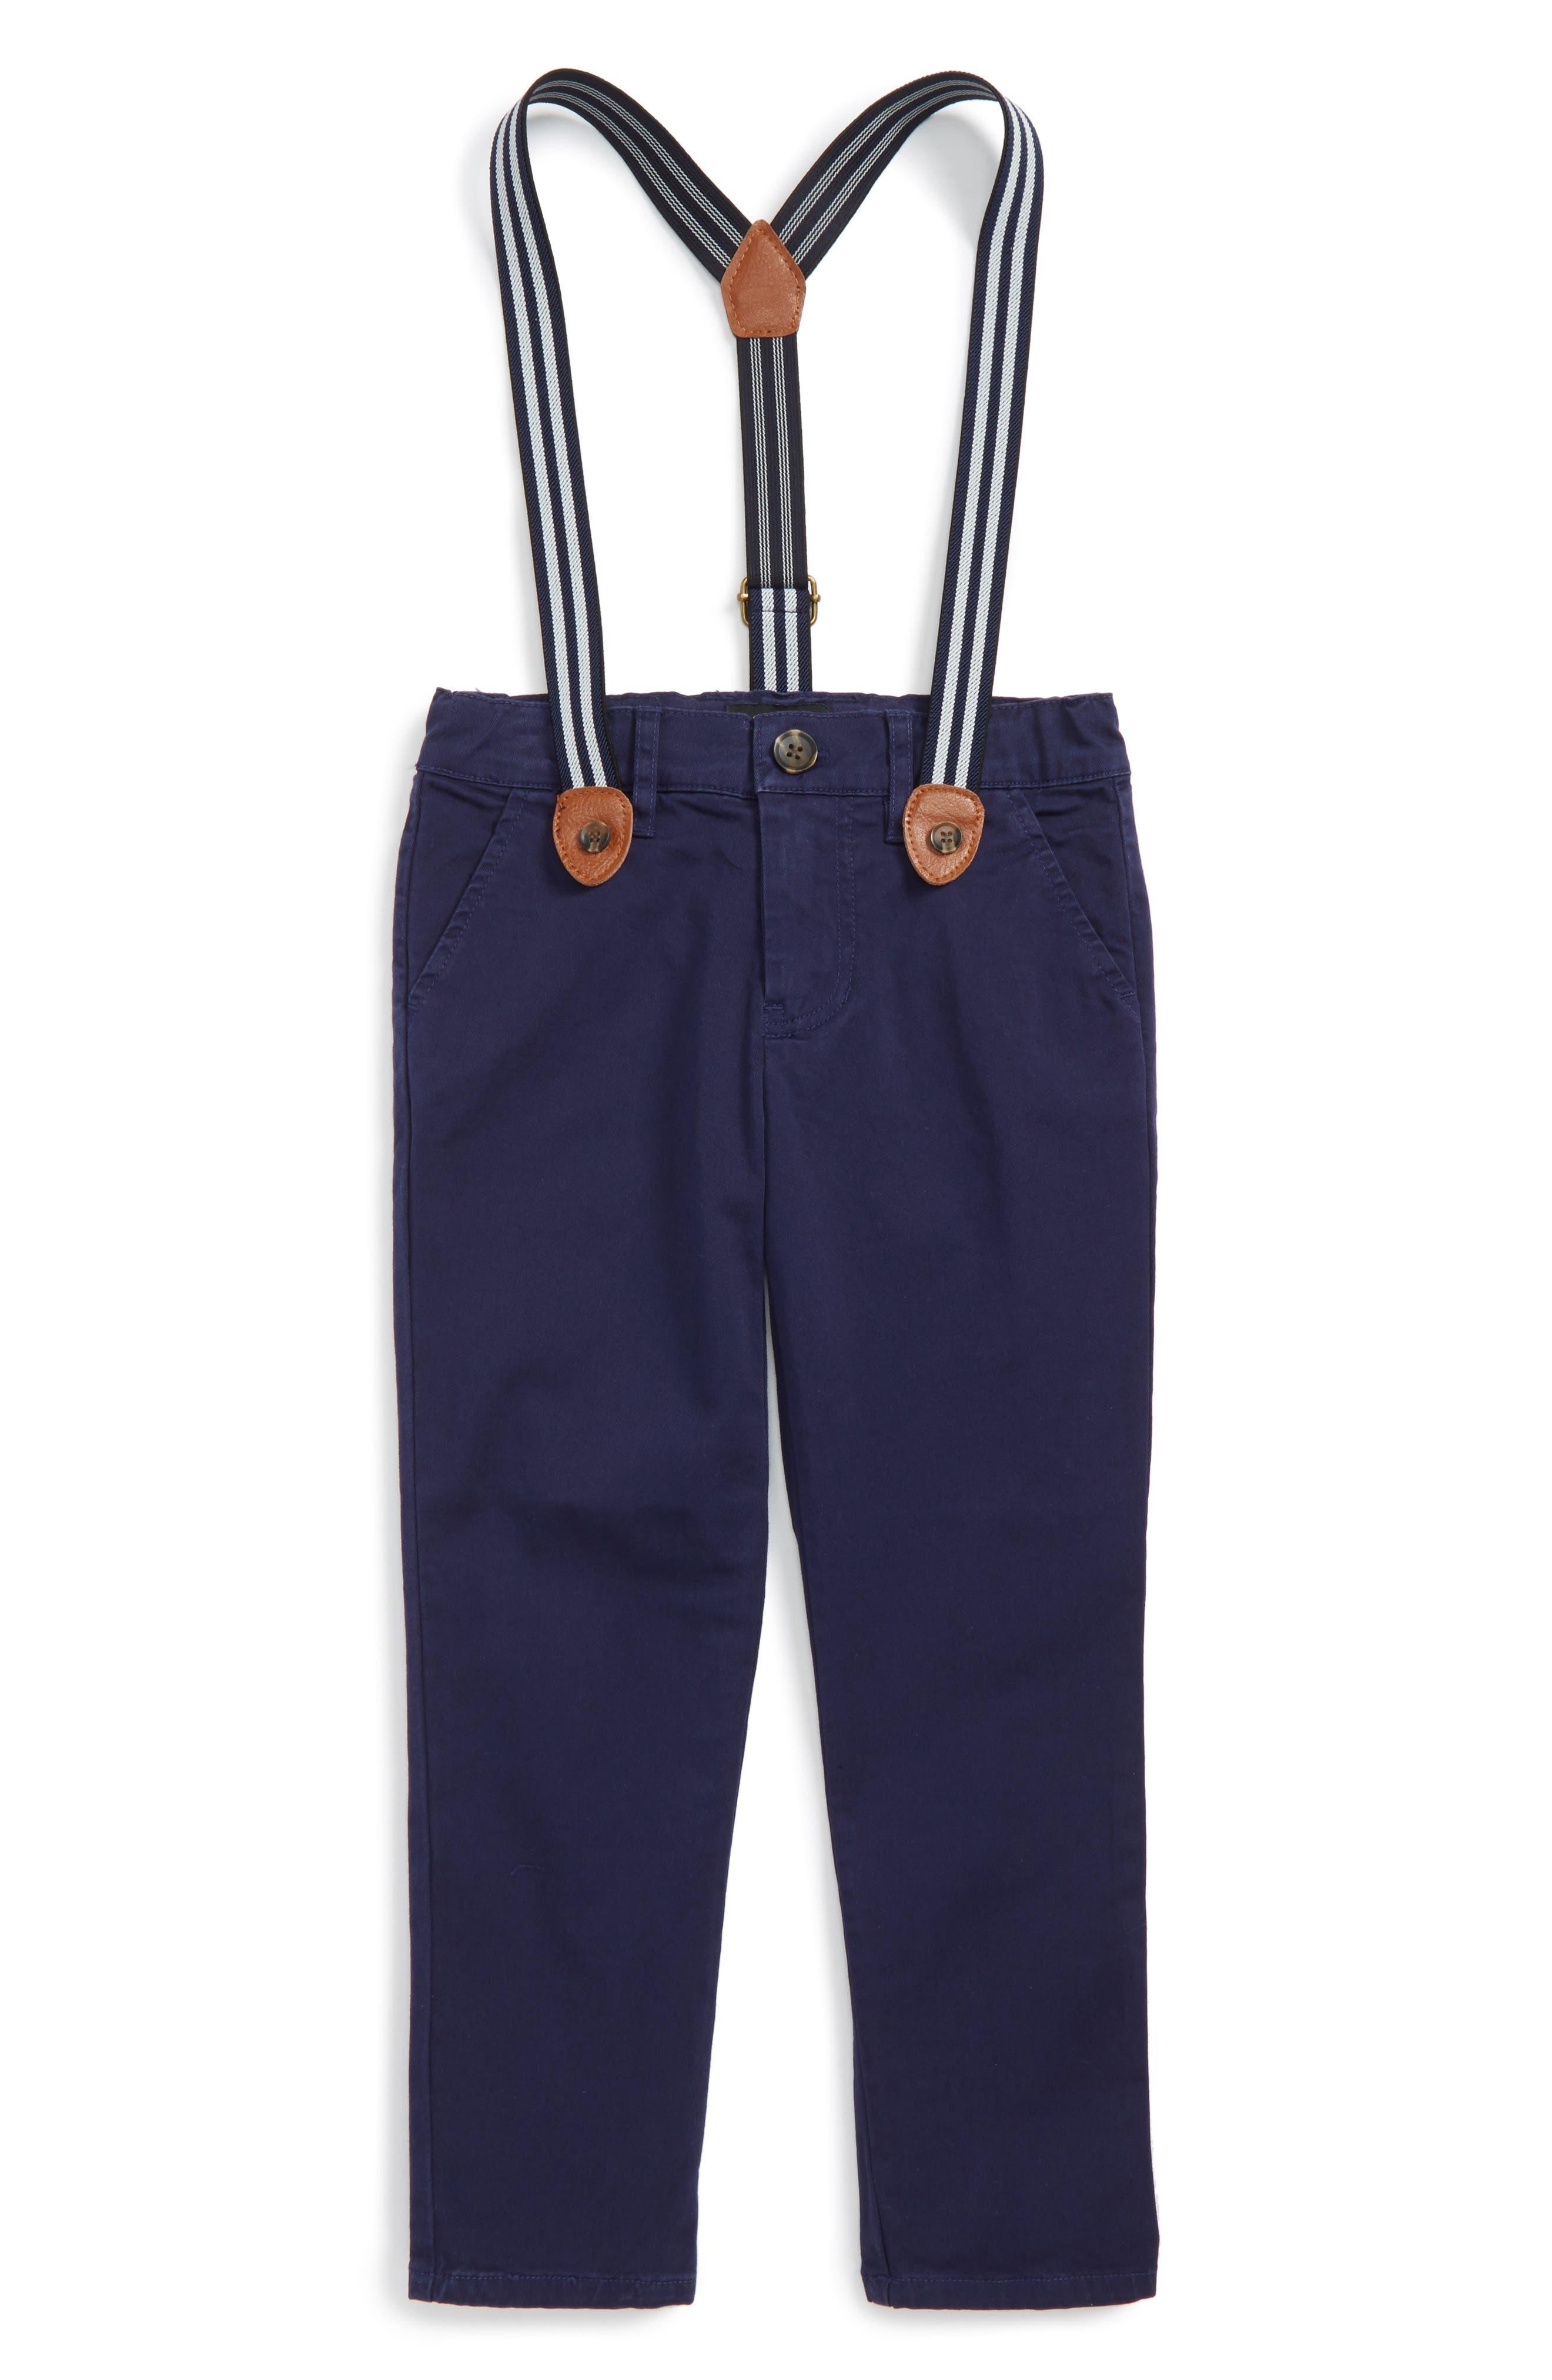 Main Image - Bardot Junior Chinos & Suspenders Set (Toddler Boys & Little Boys)